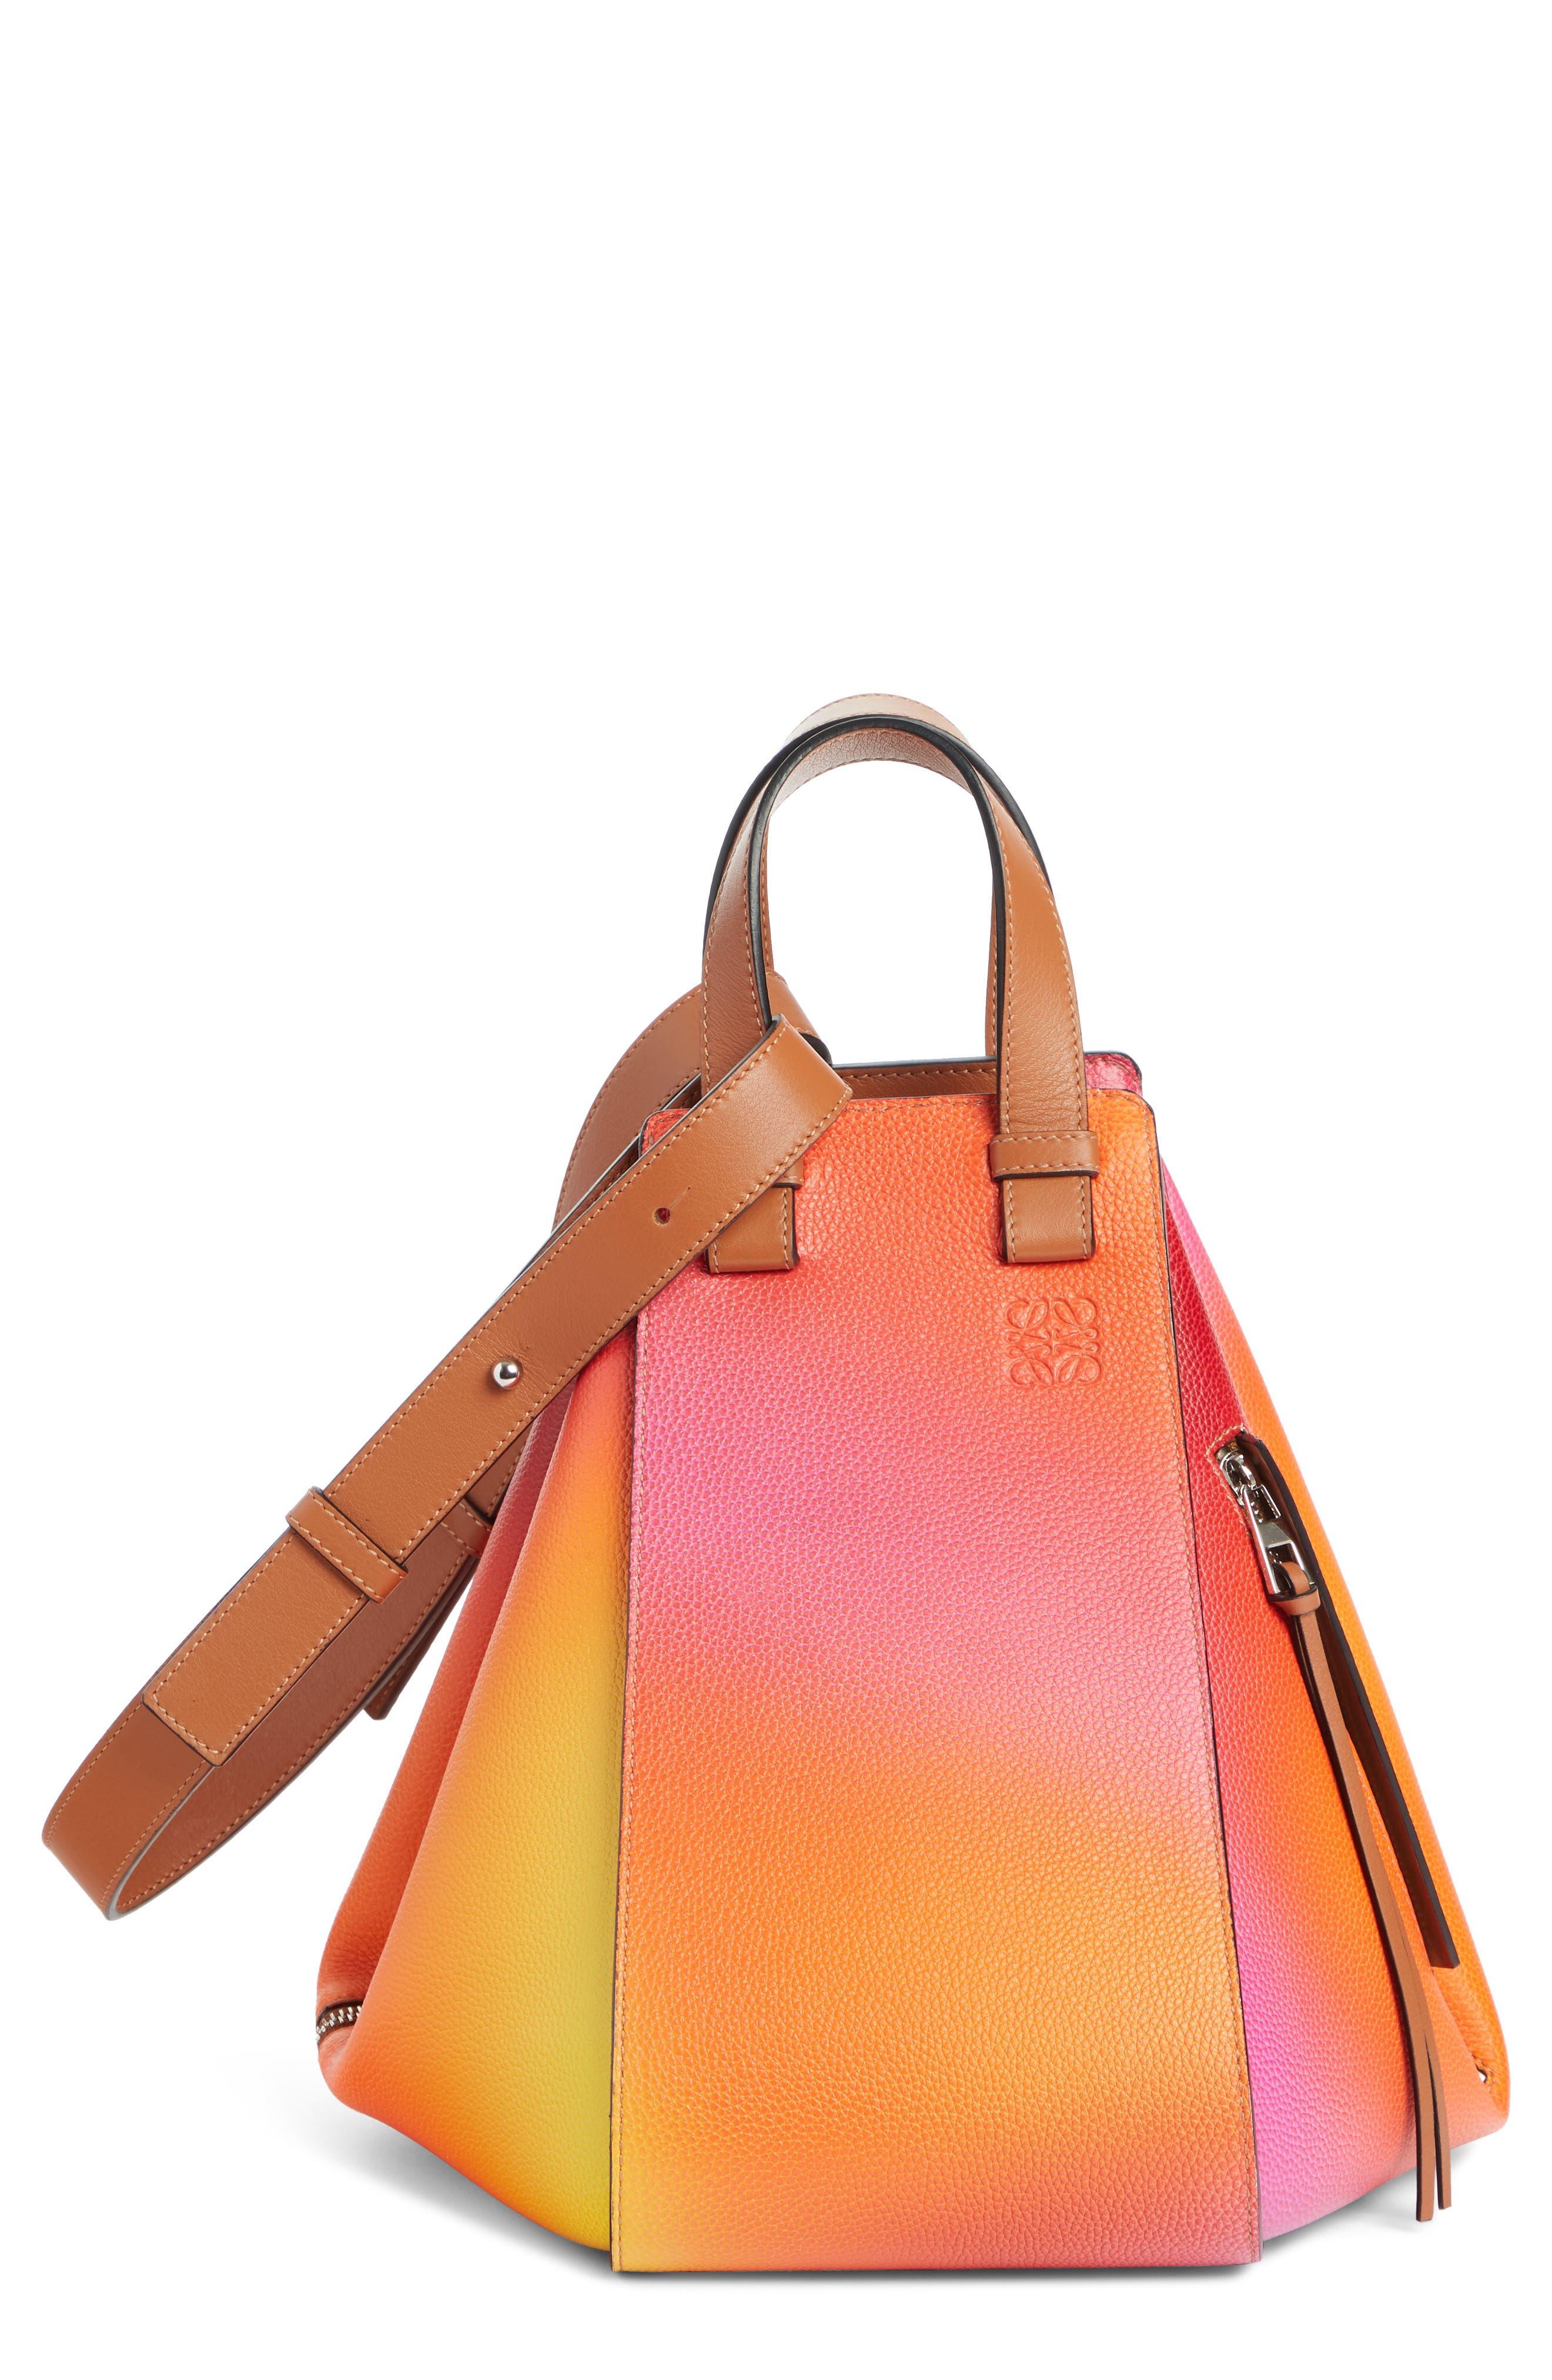 LOEWE Medium Ombré Leather Hobo, Main, color, ORANGE SUNSET